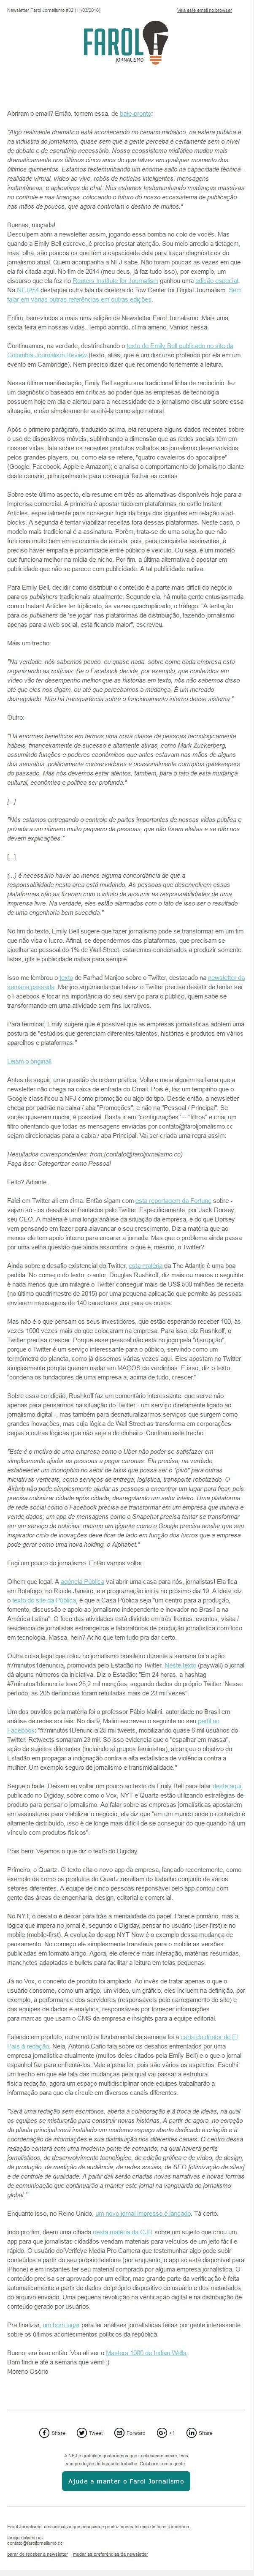 Newsletter Farol Jornalismo